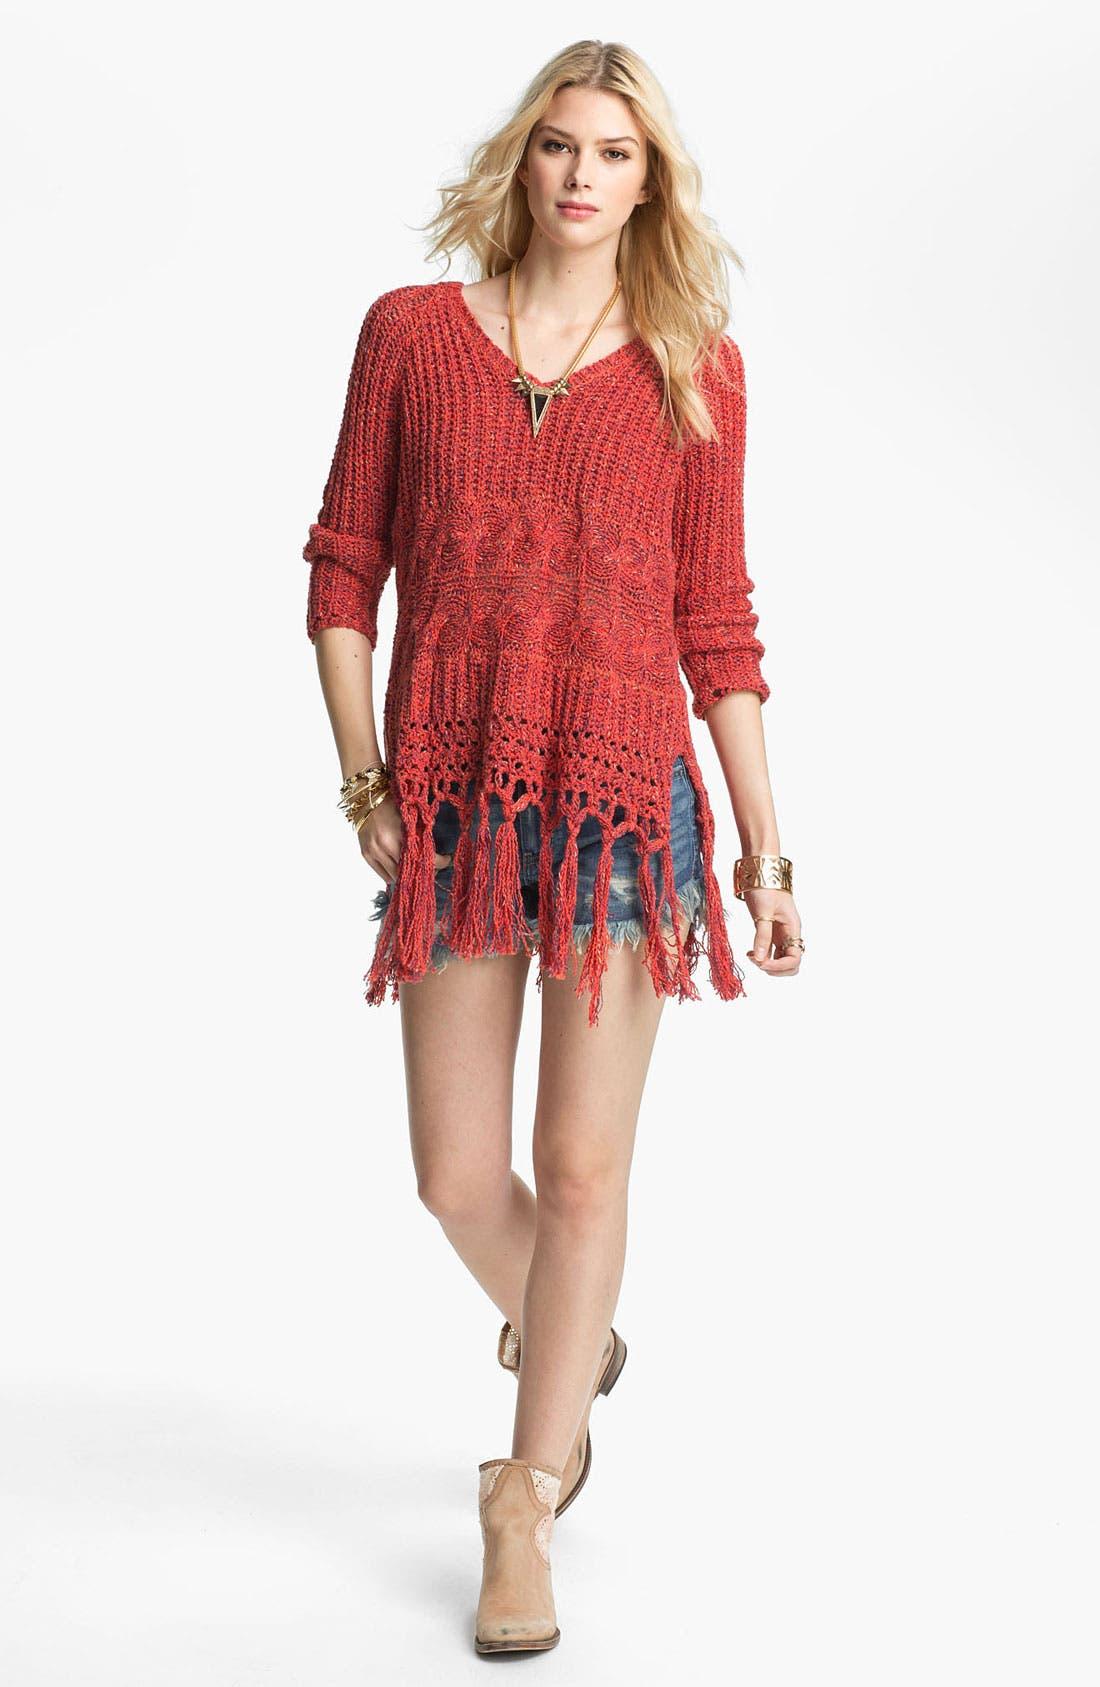 Alternate Image 1 Selected - Free People 'Santa Rosa' Fringe Trim Hooded Sweater